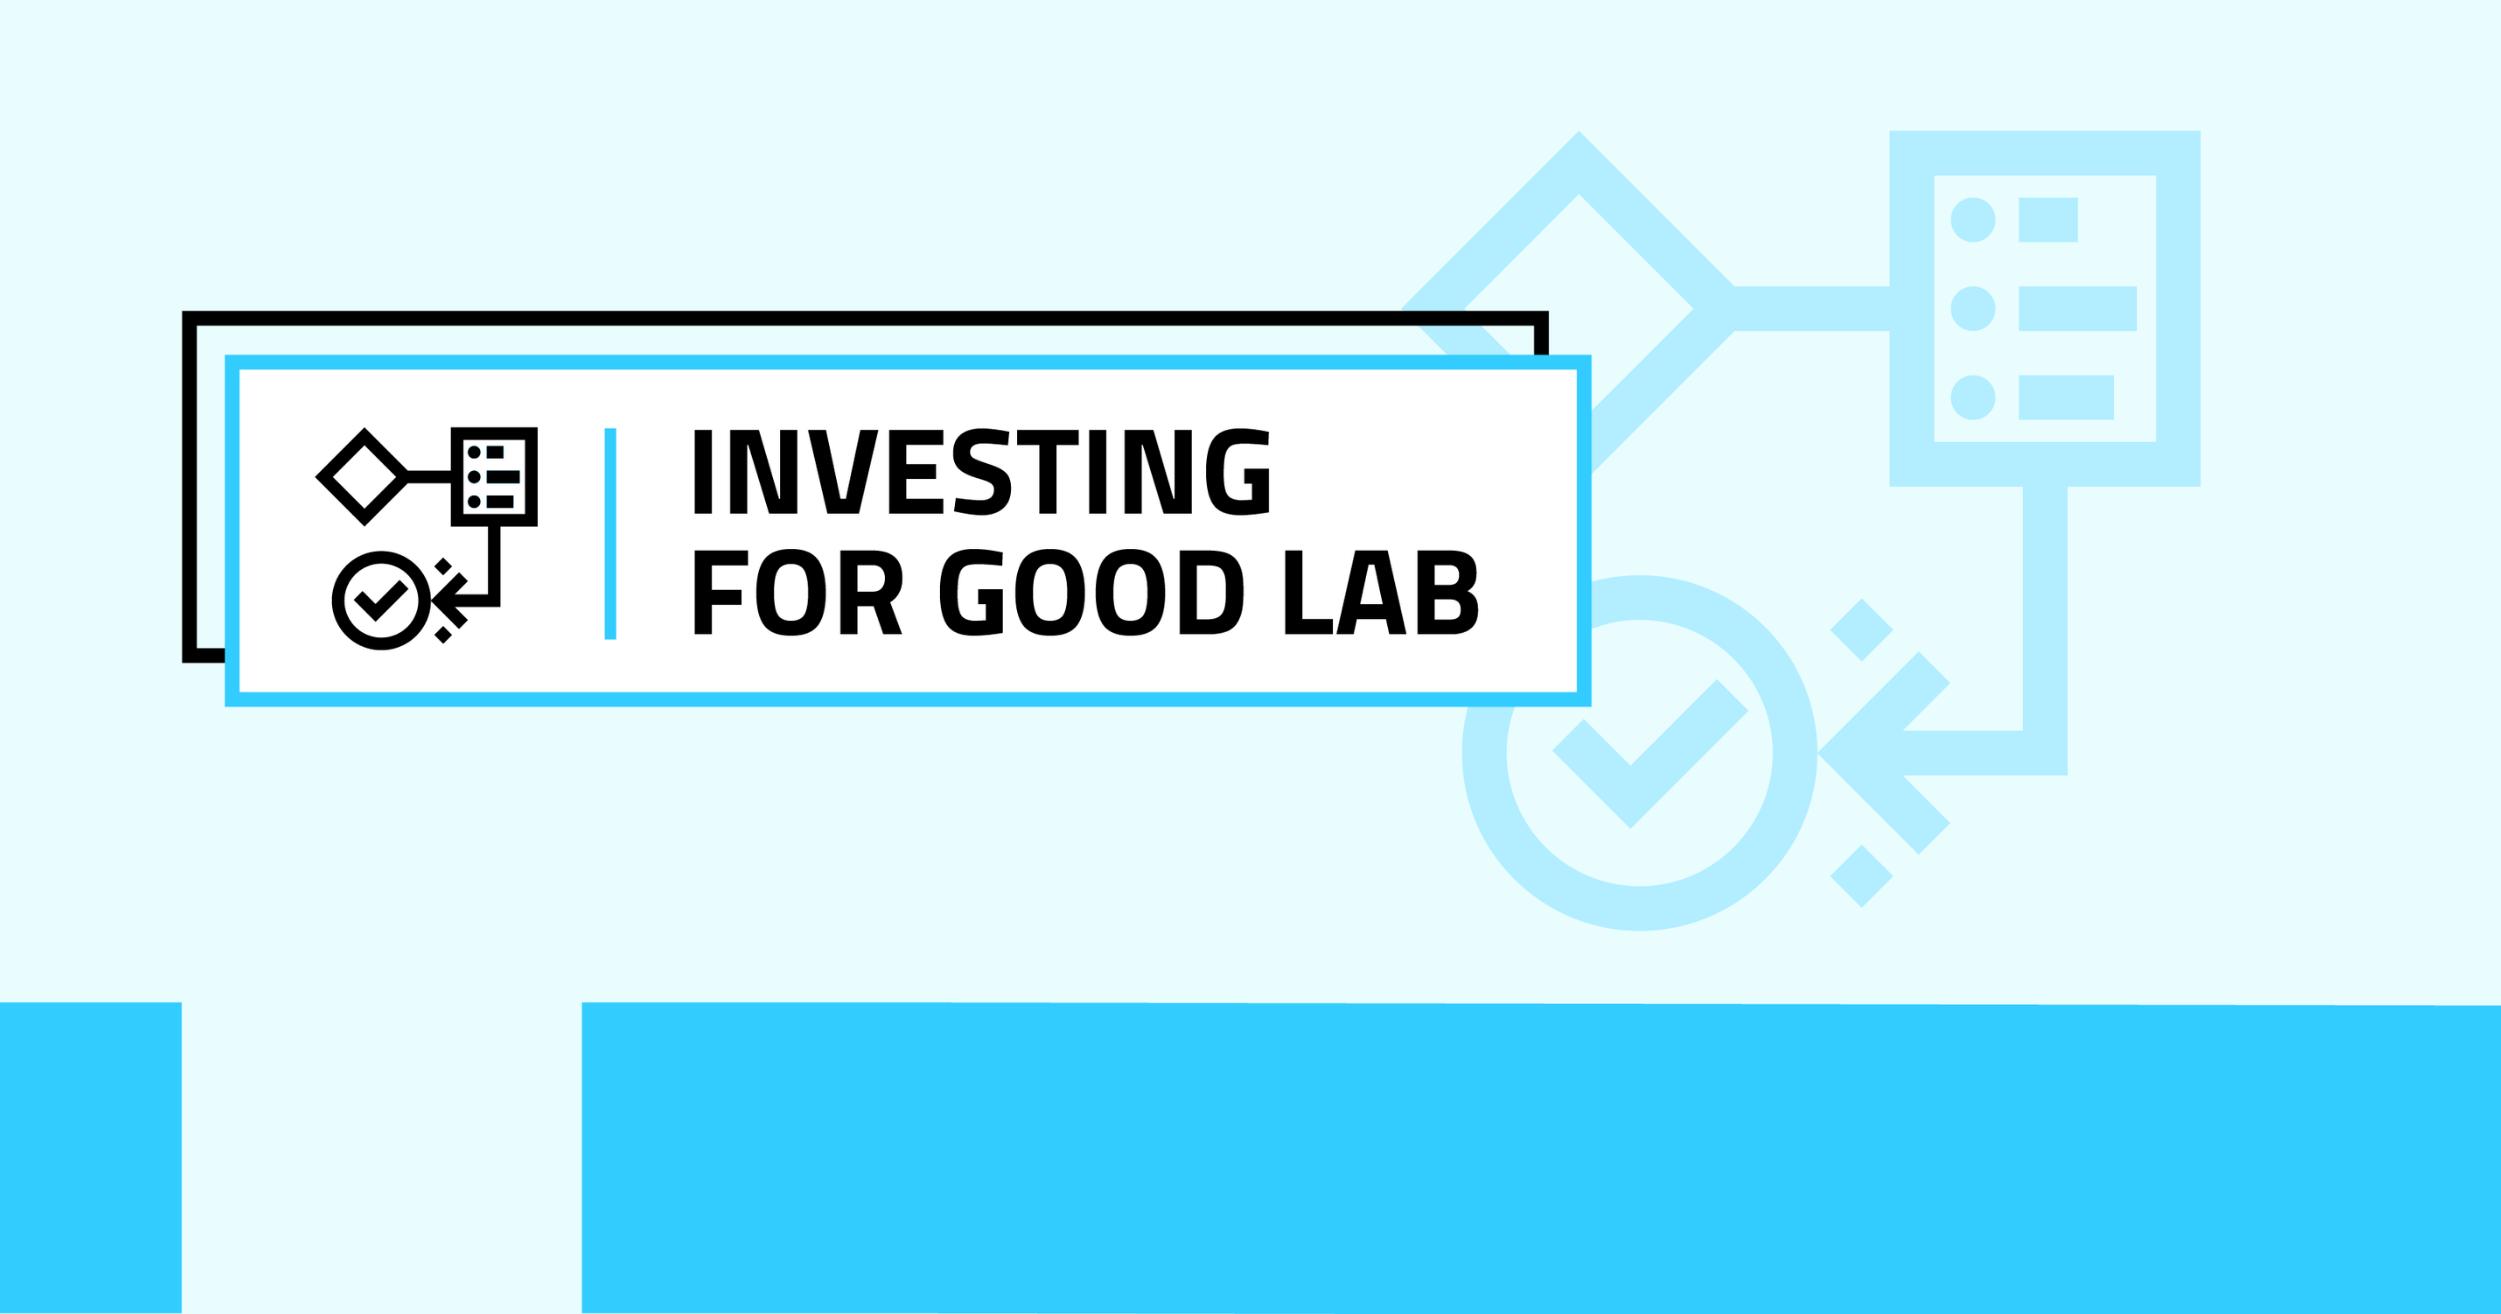 Investing for good università